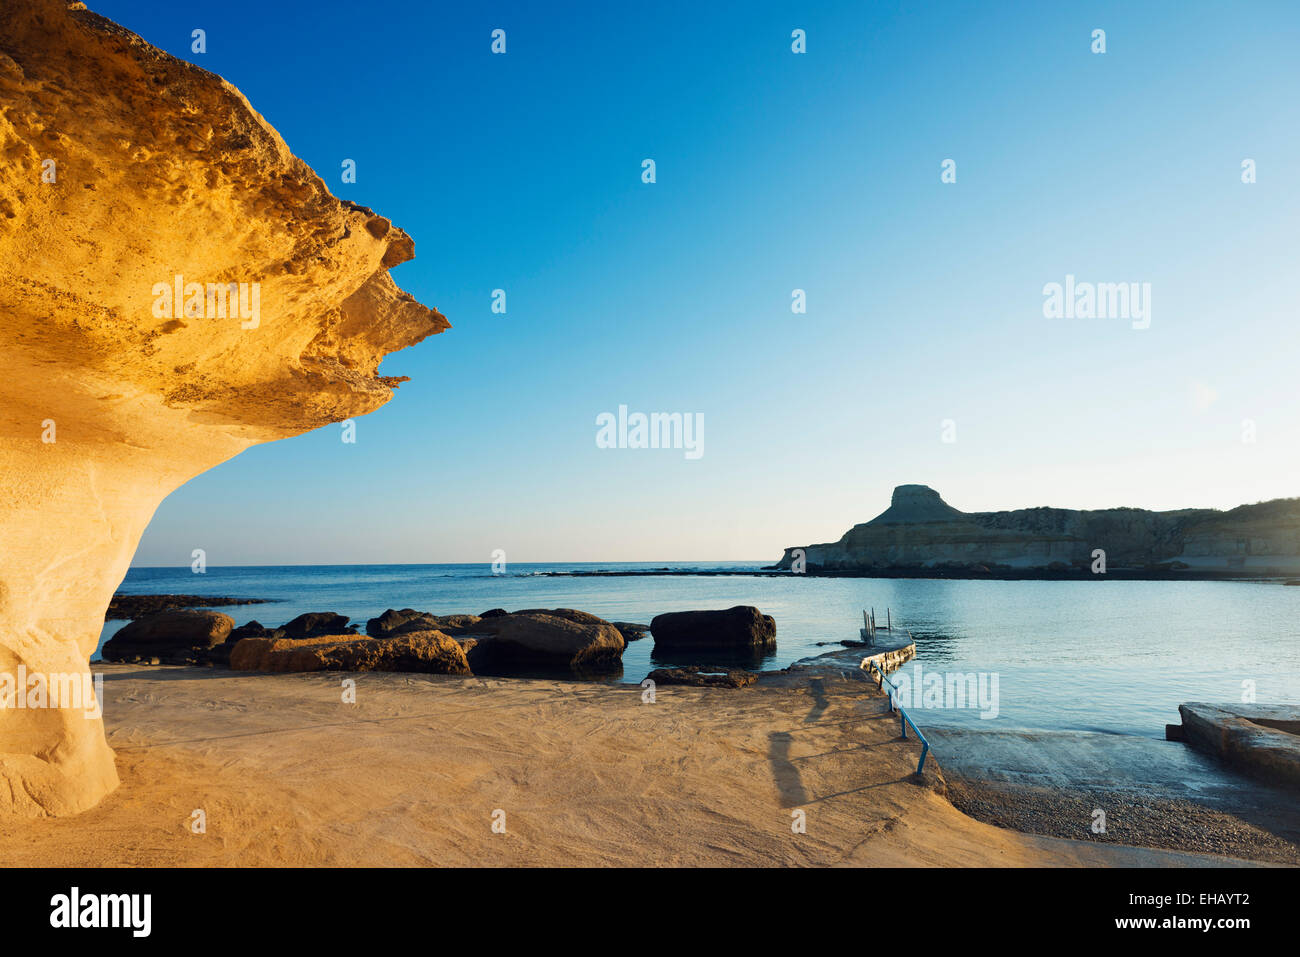 Mediterranen Europa, Malta, Insel Gozo, Xwejni Bay Stockbild